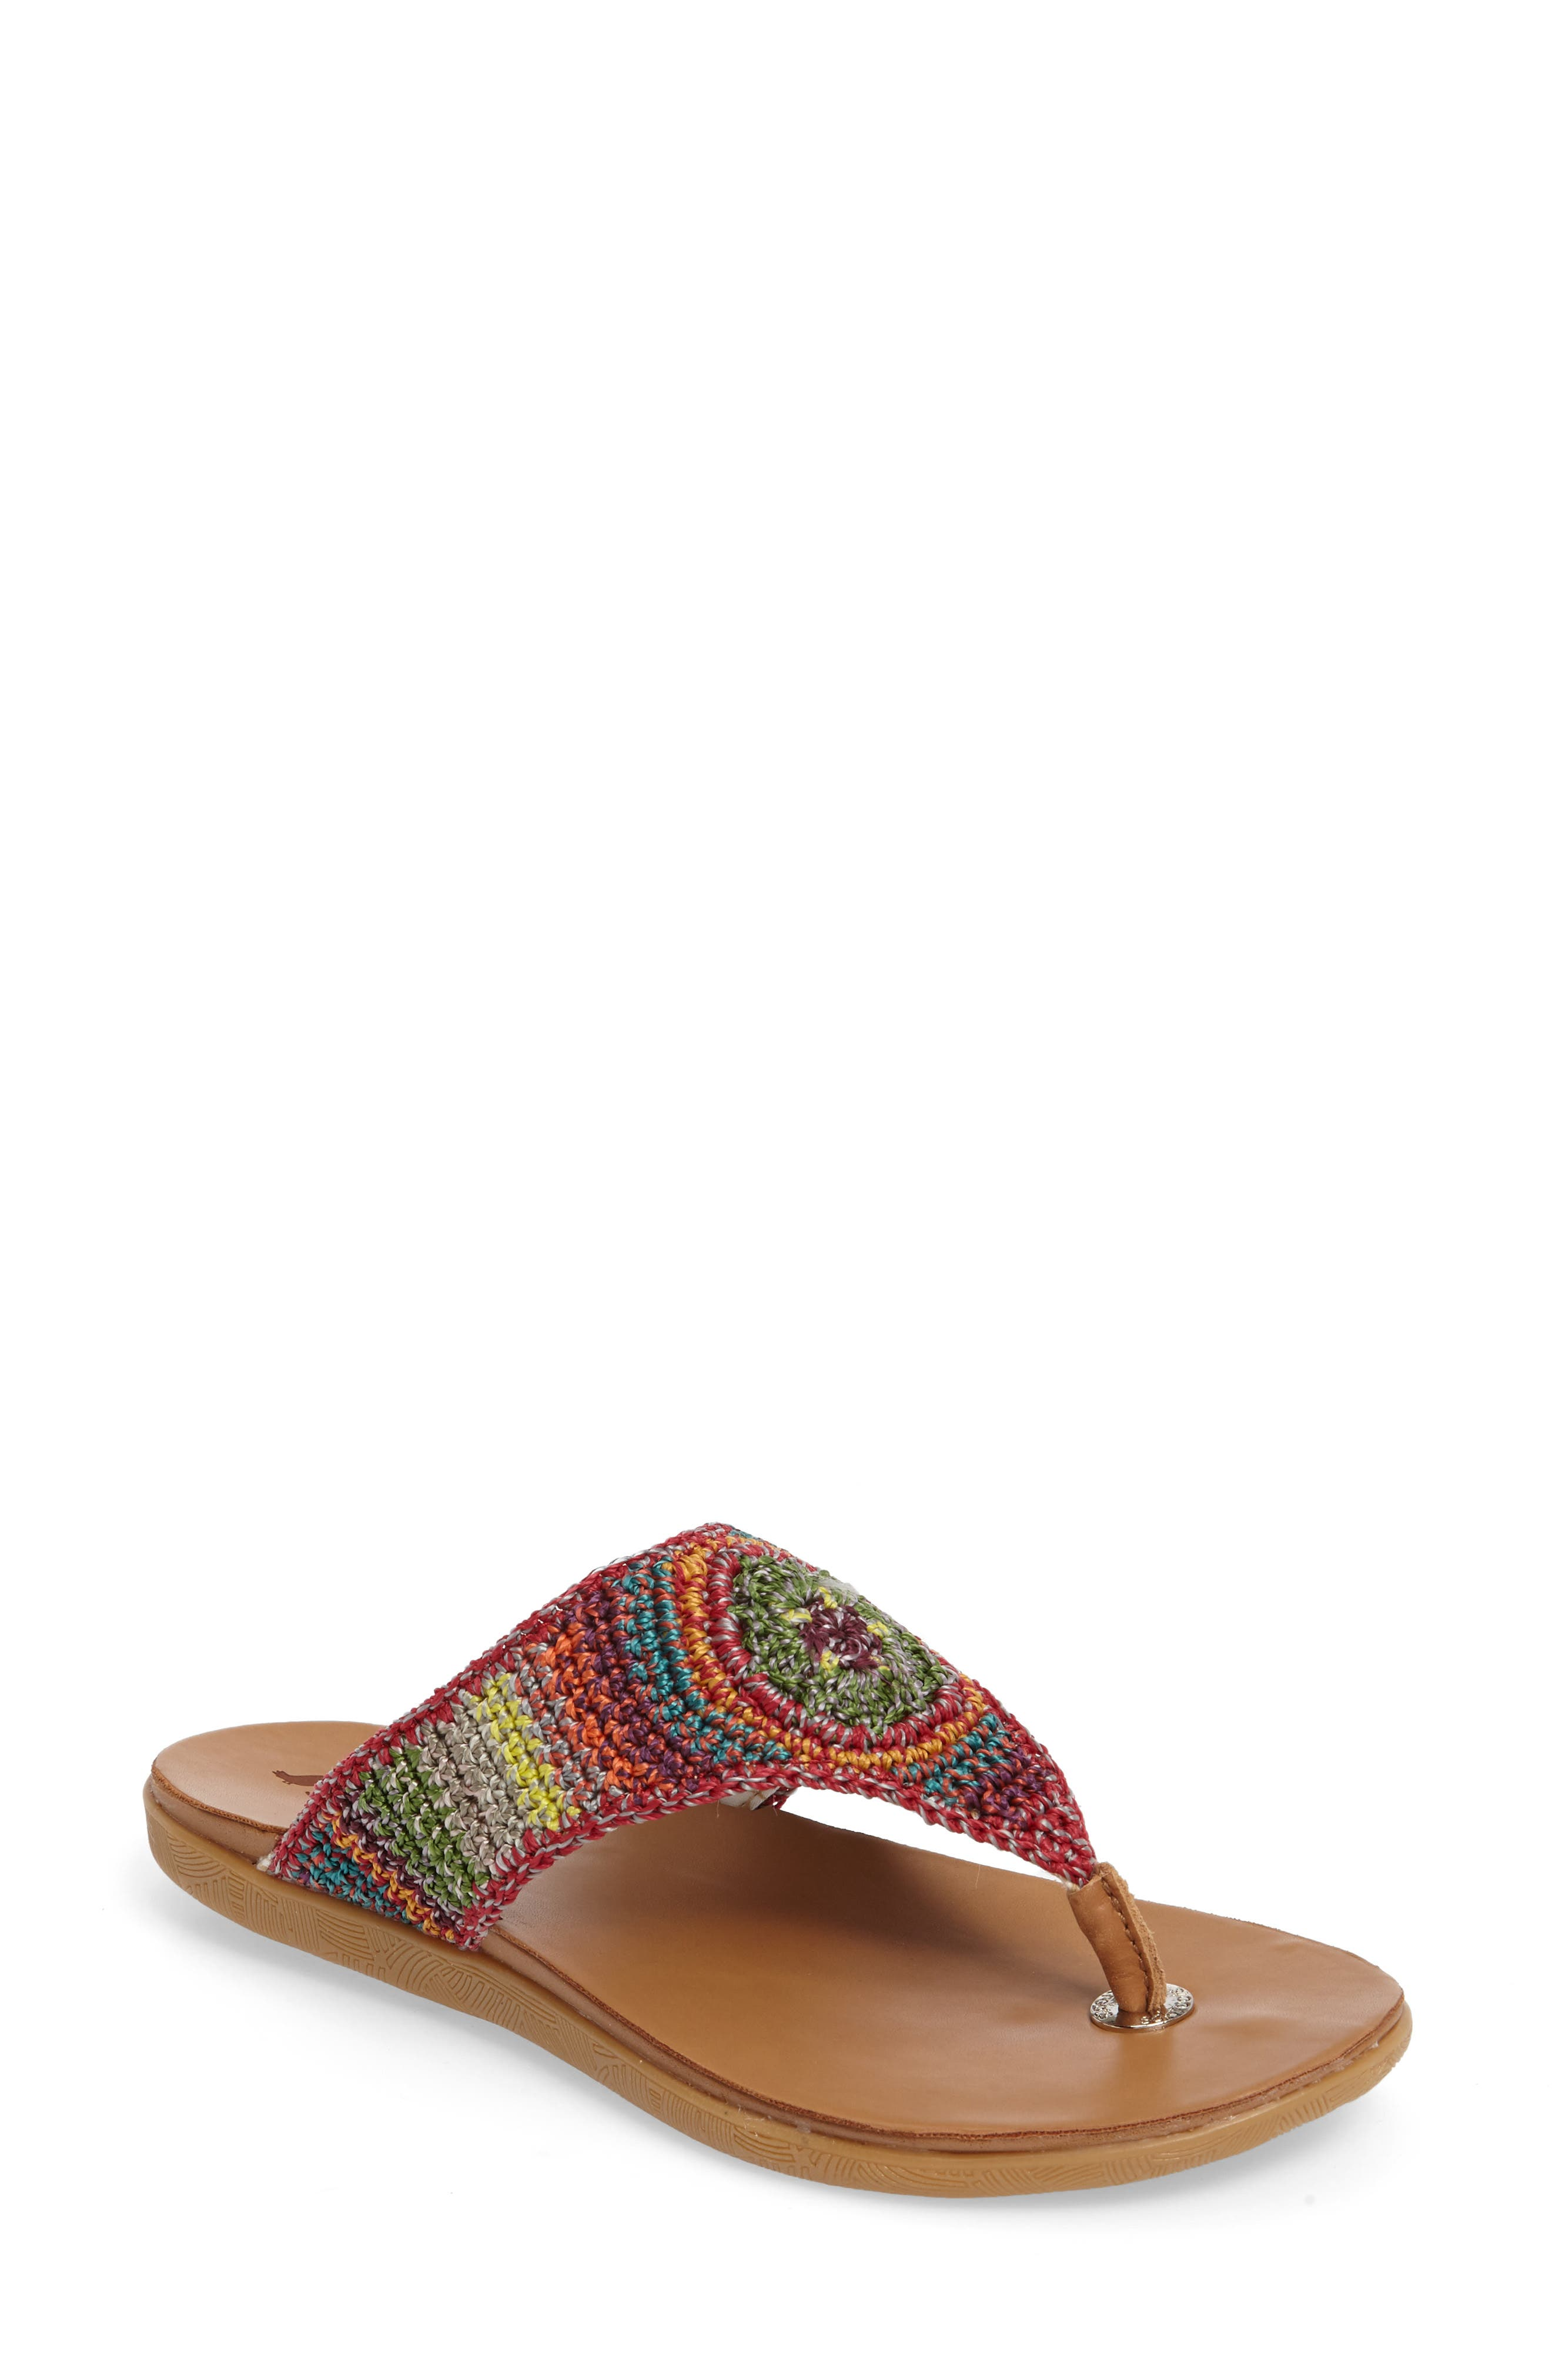 Alternate Image 1 Selected - Sakroots Sarria Flip Flop (Women)